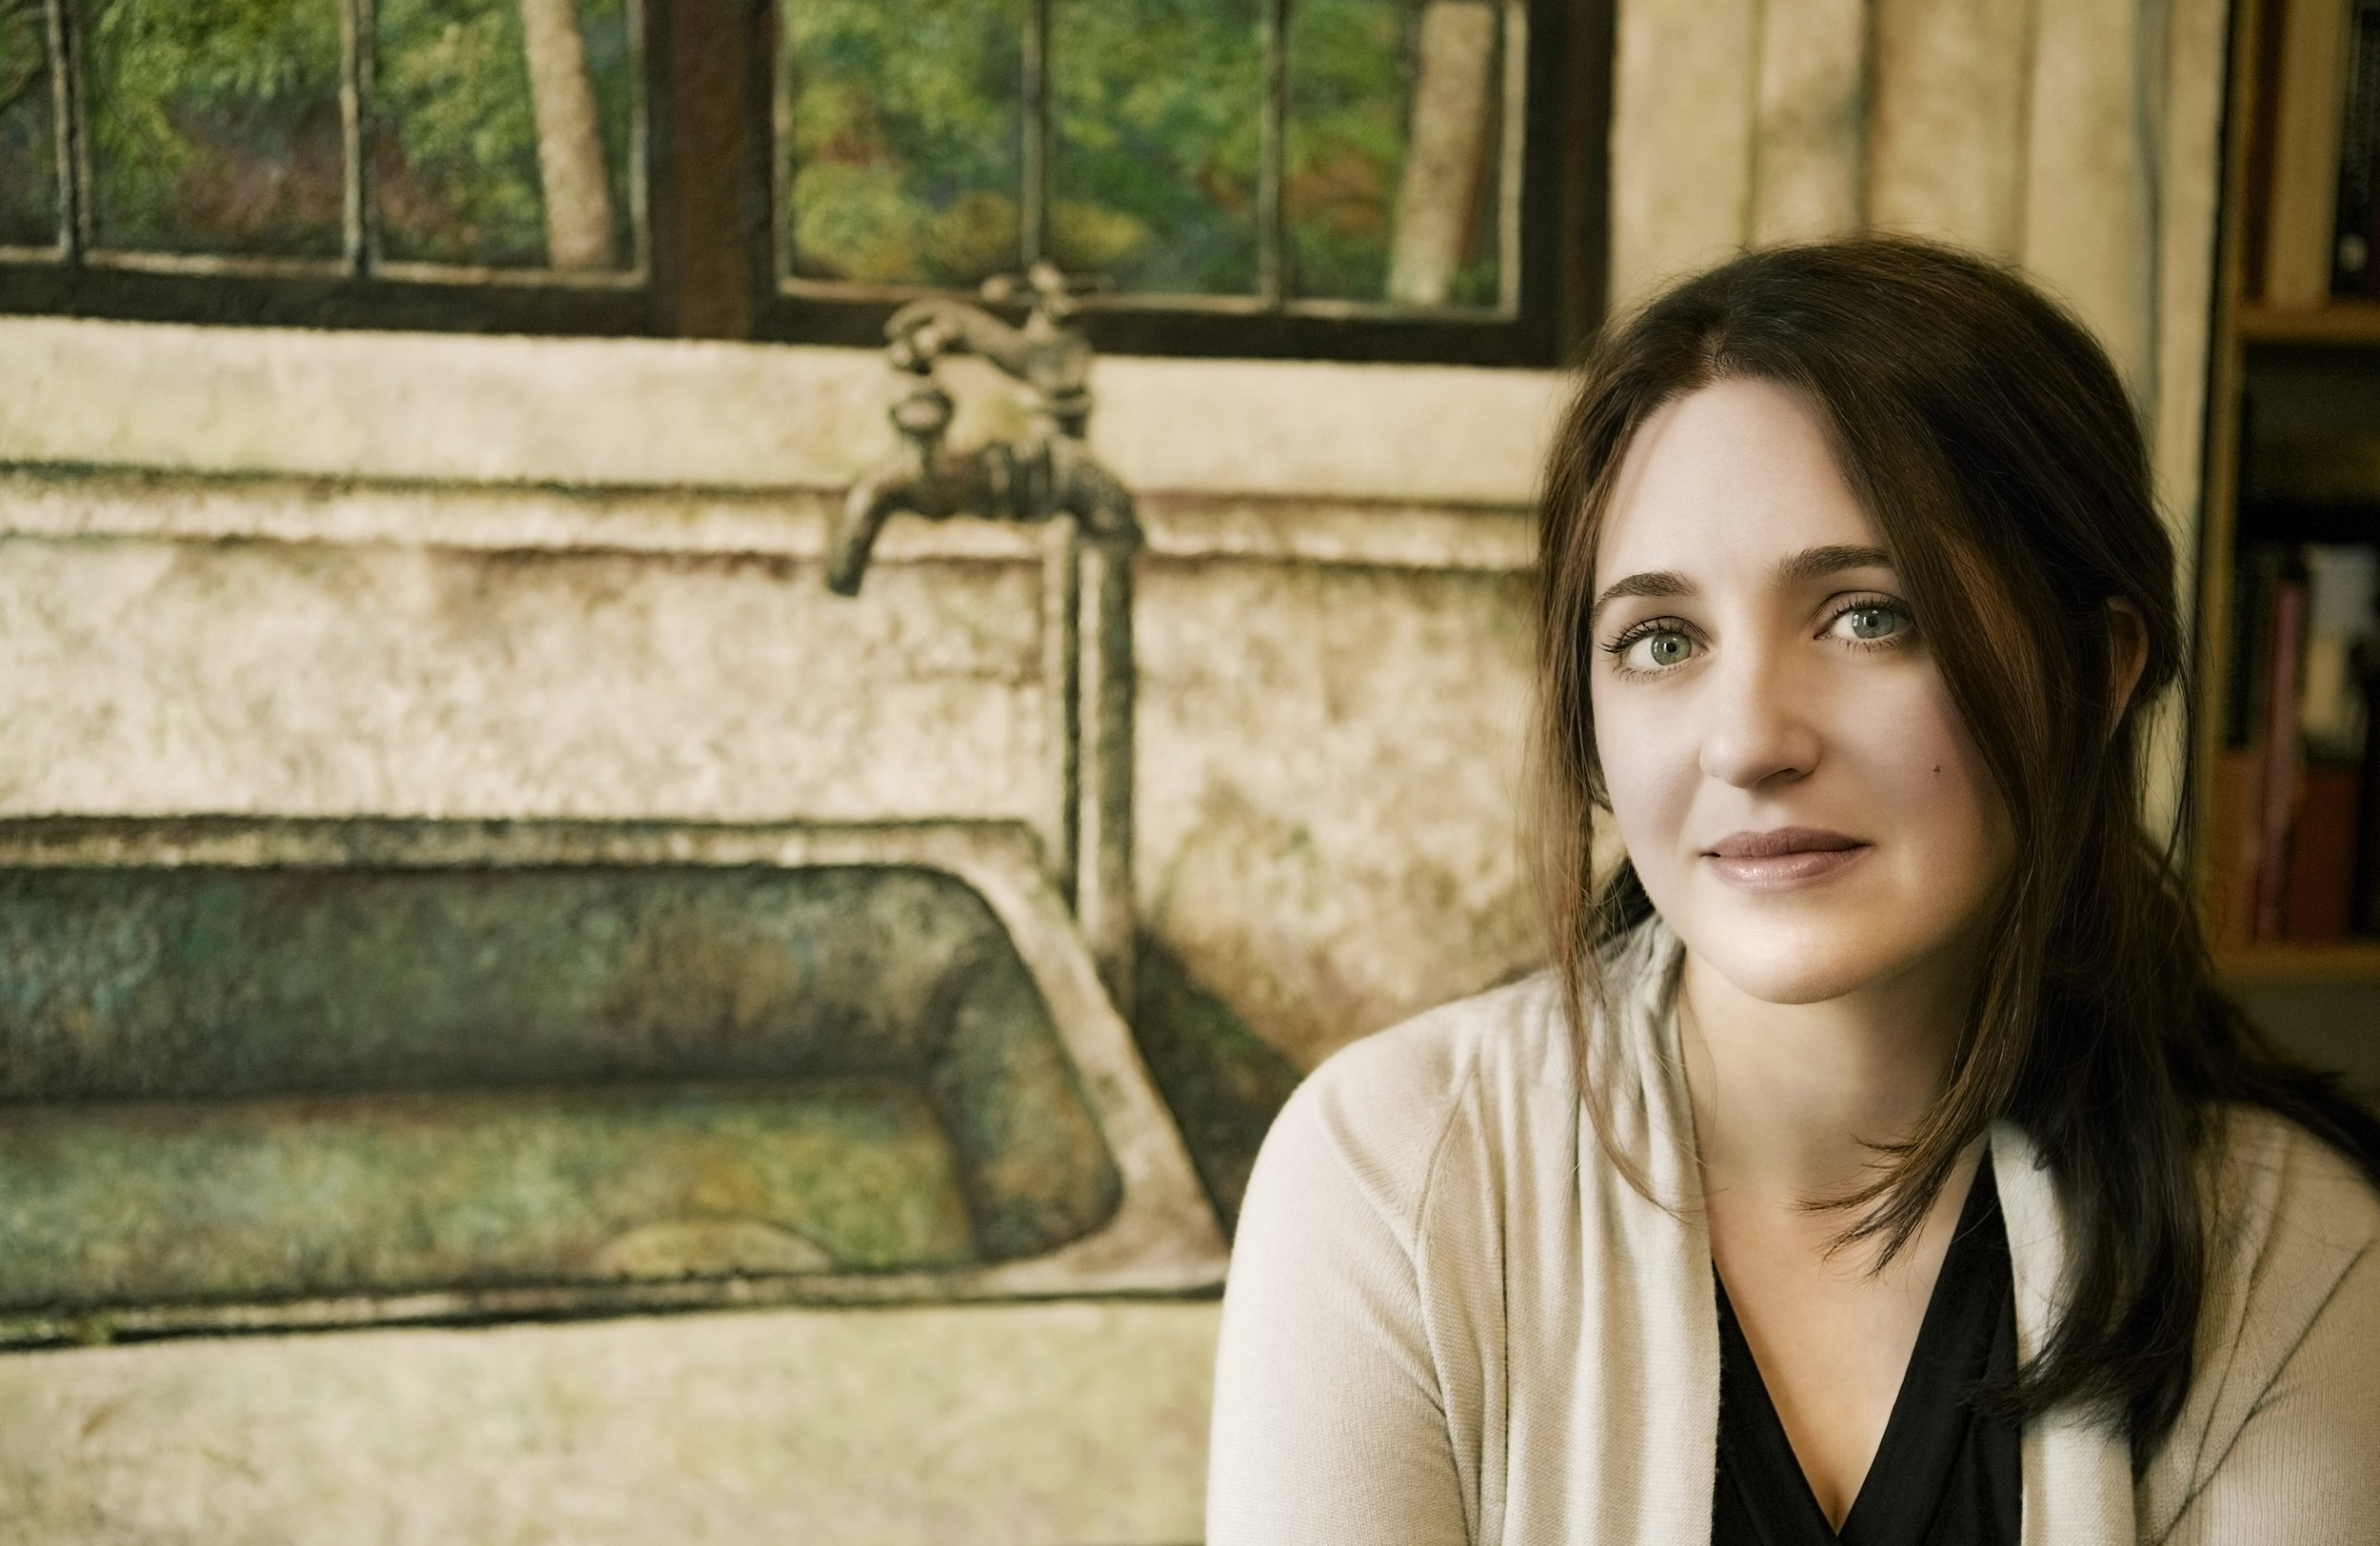 Simone Dinnerstein © Lisa Marie Mazzucco